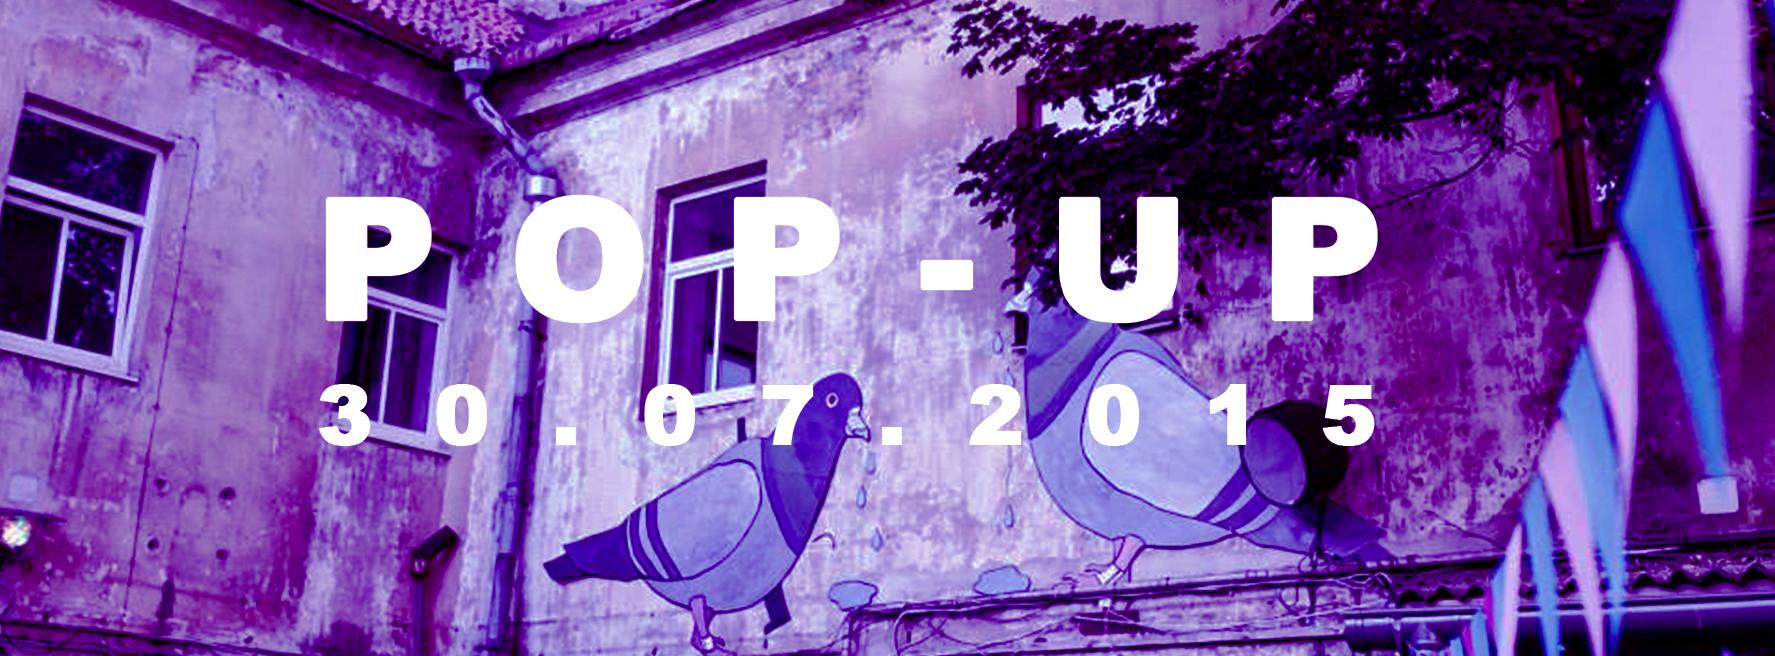 pop-up-2